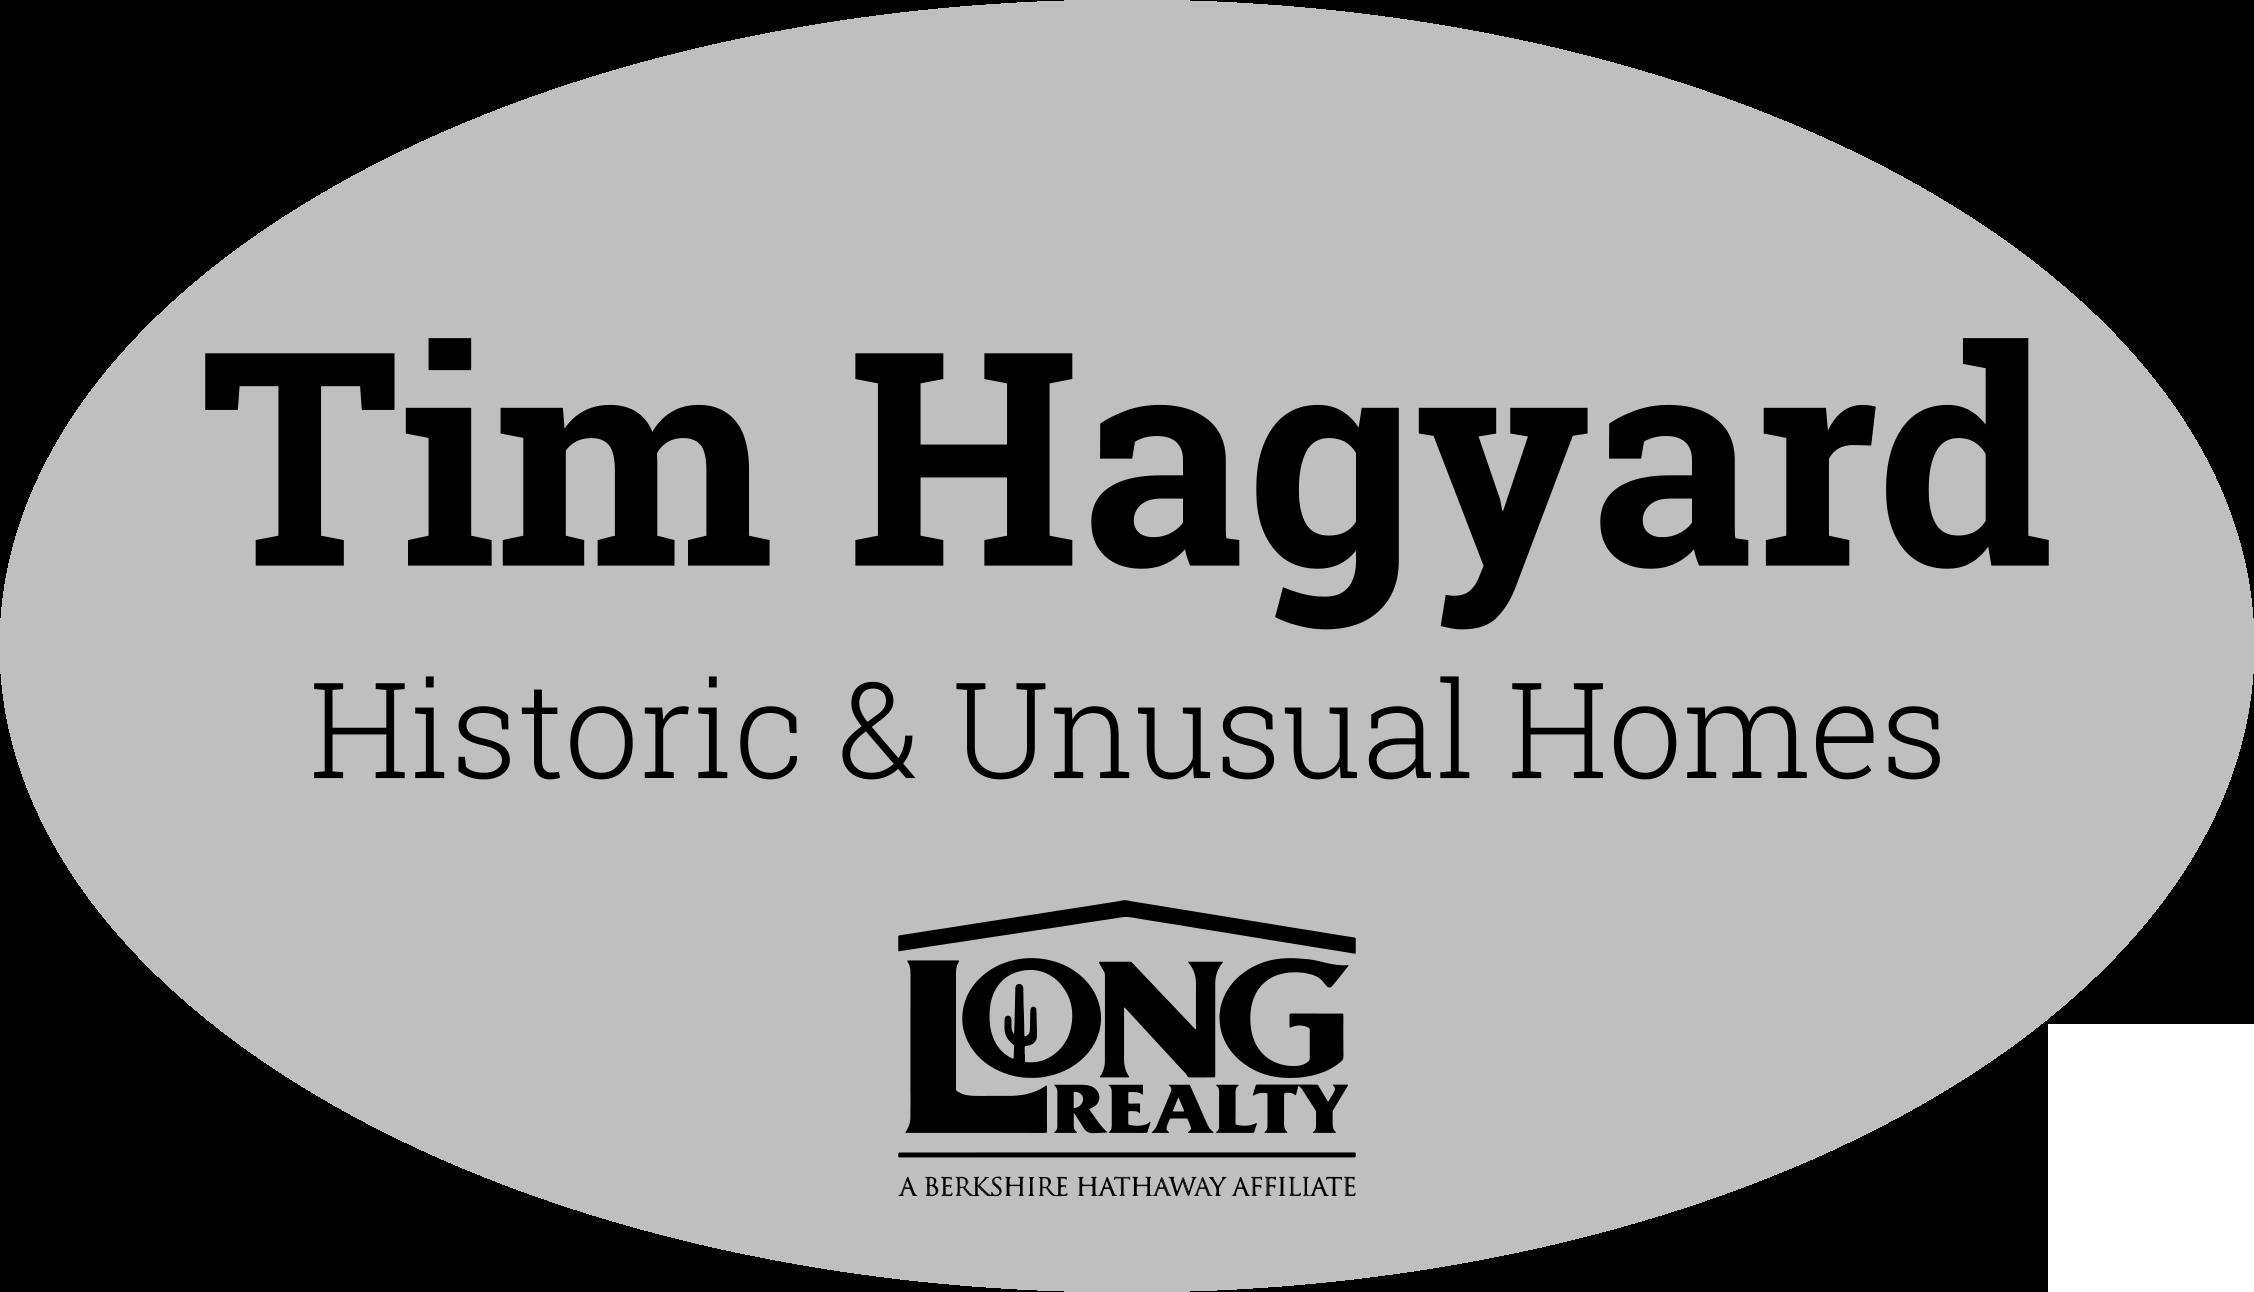 Tim Hagyard Long Realty